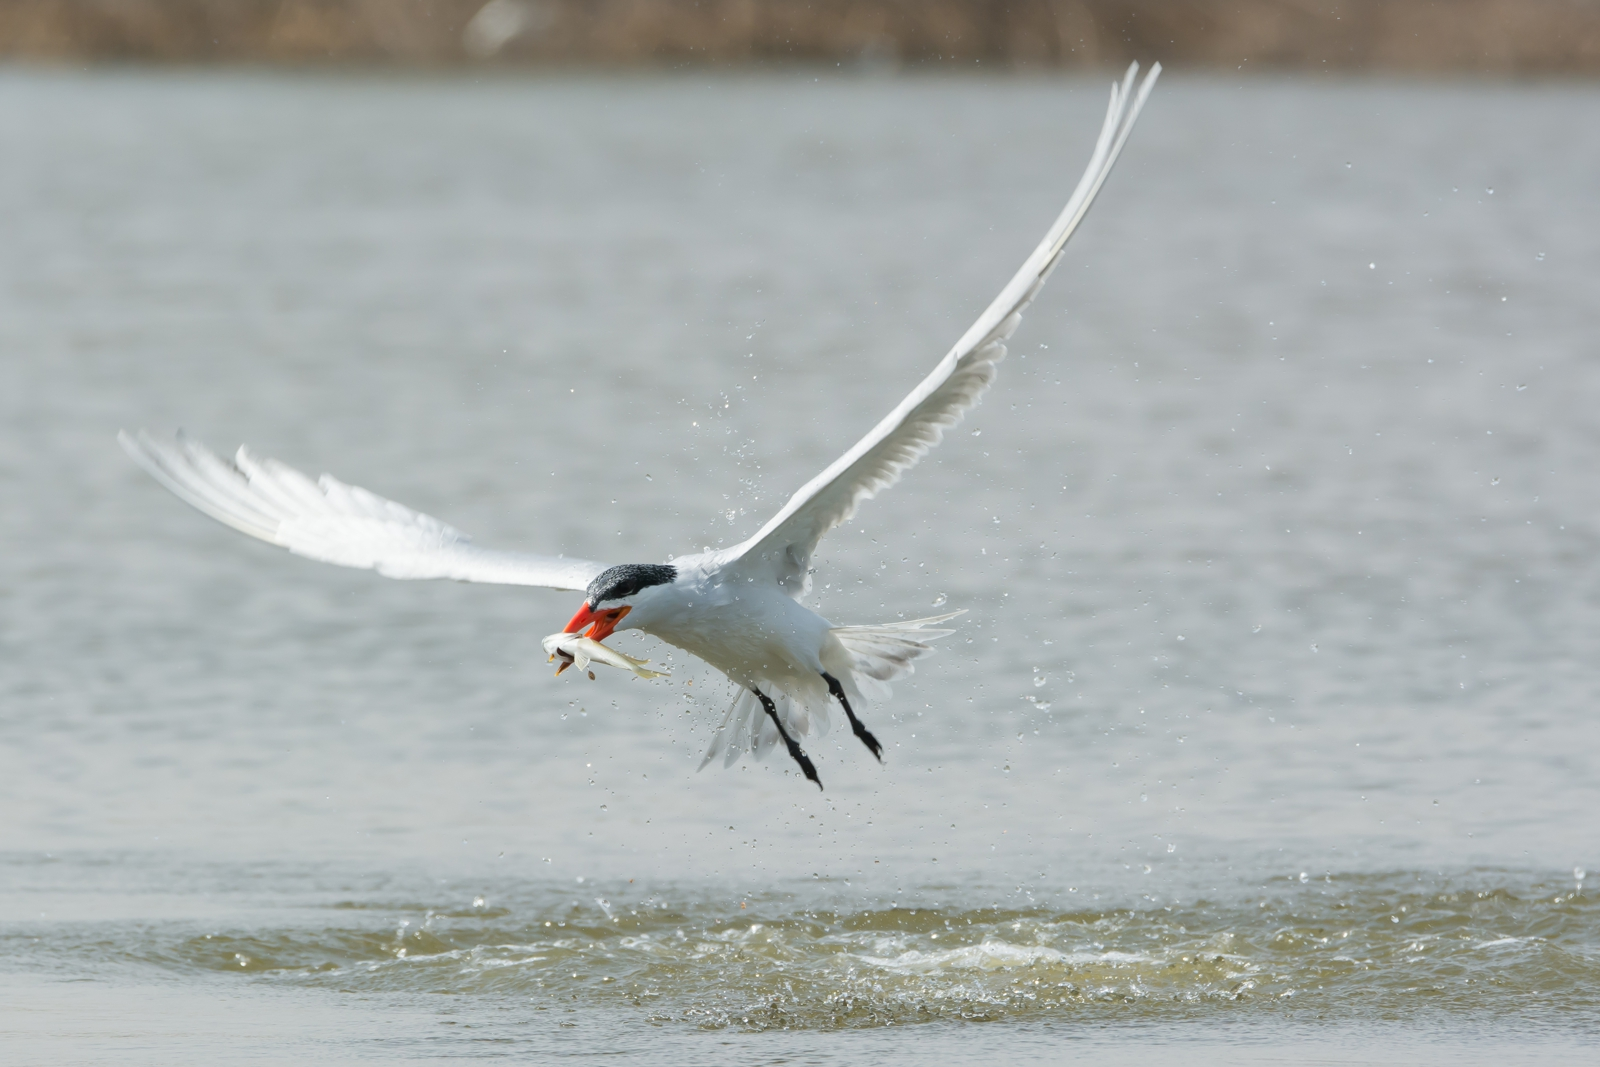 Avian Predators - Caspian Tern eating salmonids - #wetrackthat HTI Acoustic Telemetry